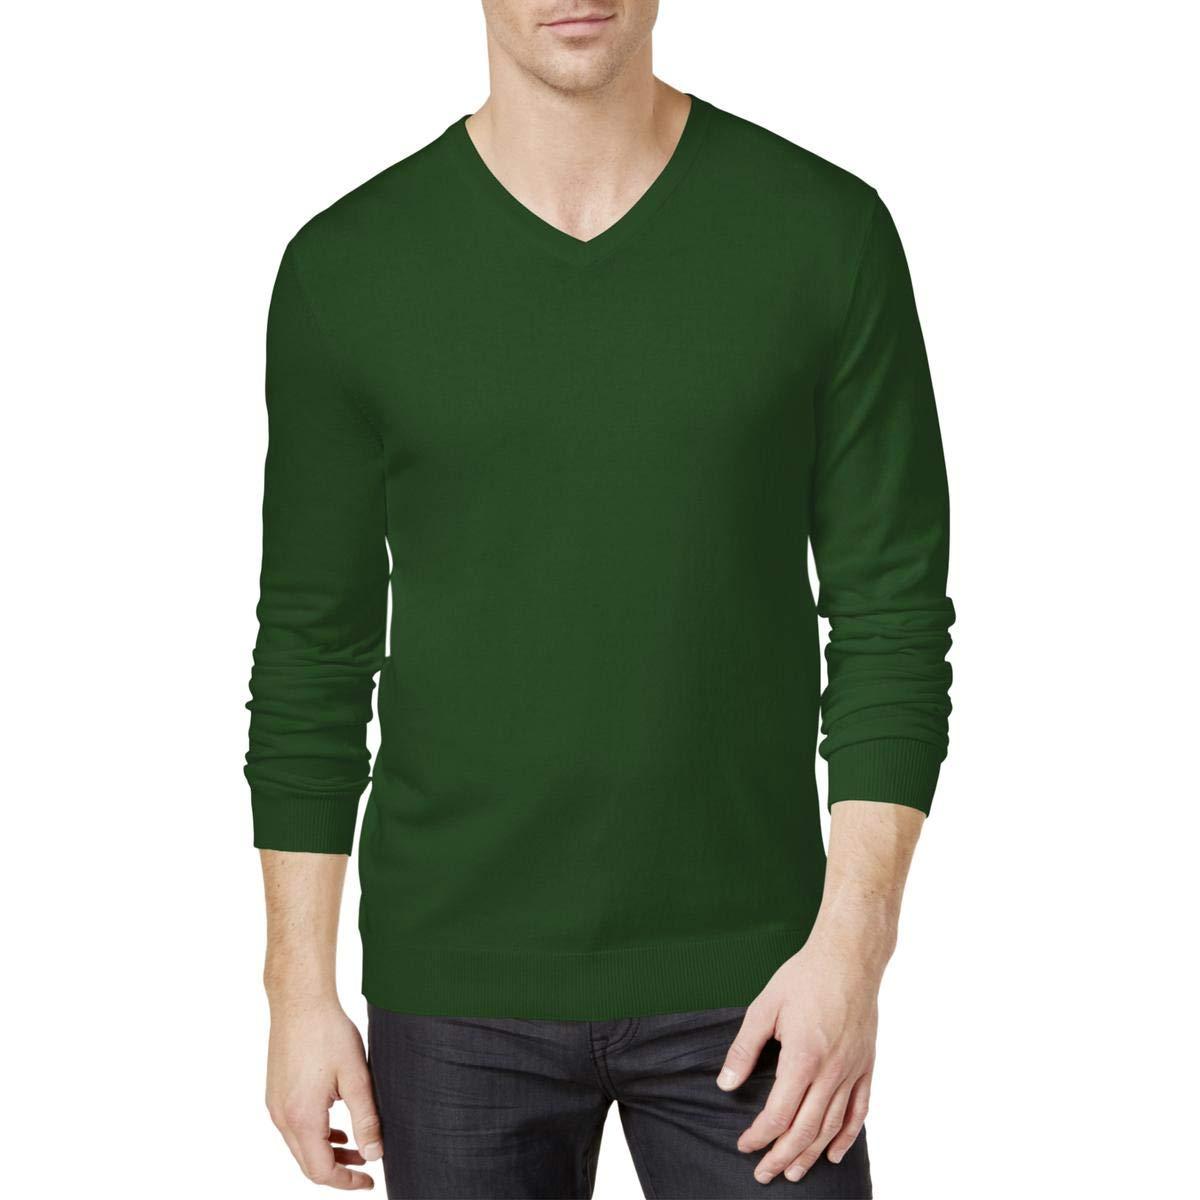 Alfani Mens Knit Long Sleeves Pullover Sweater